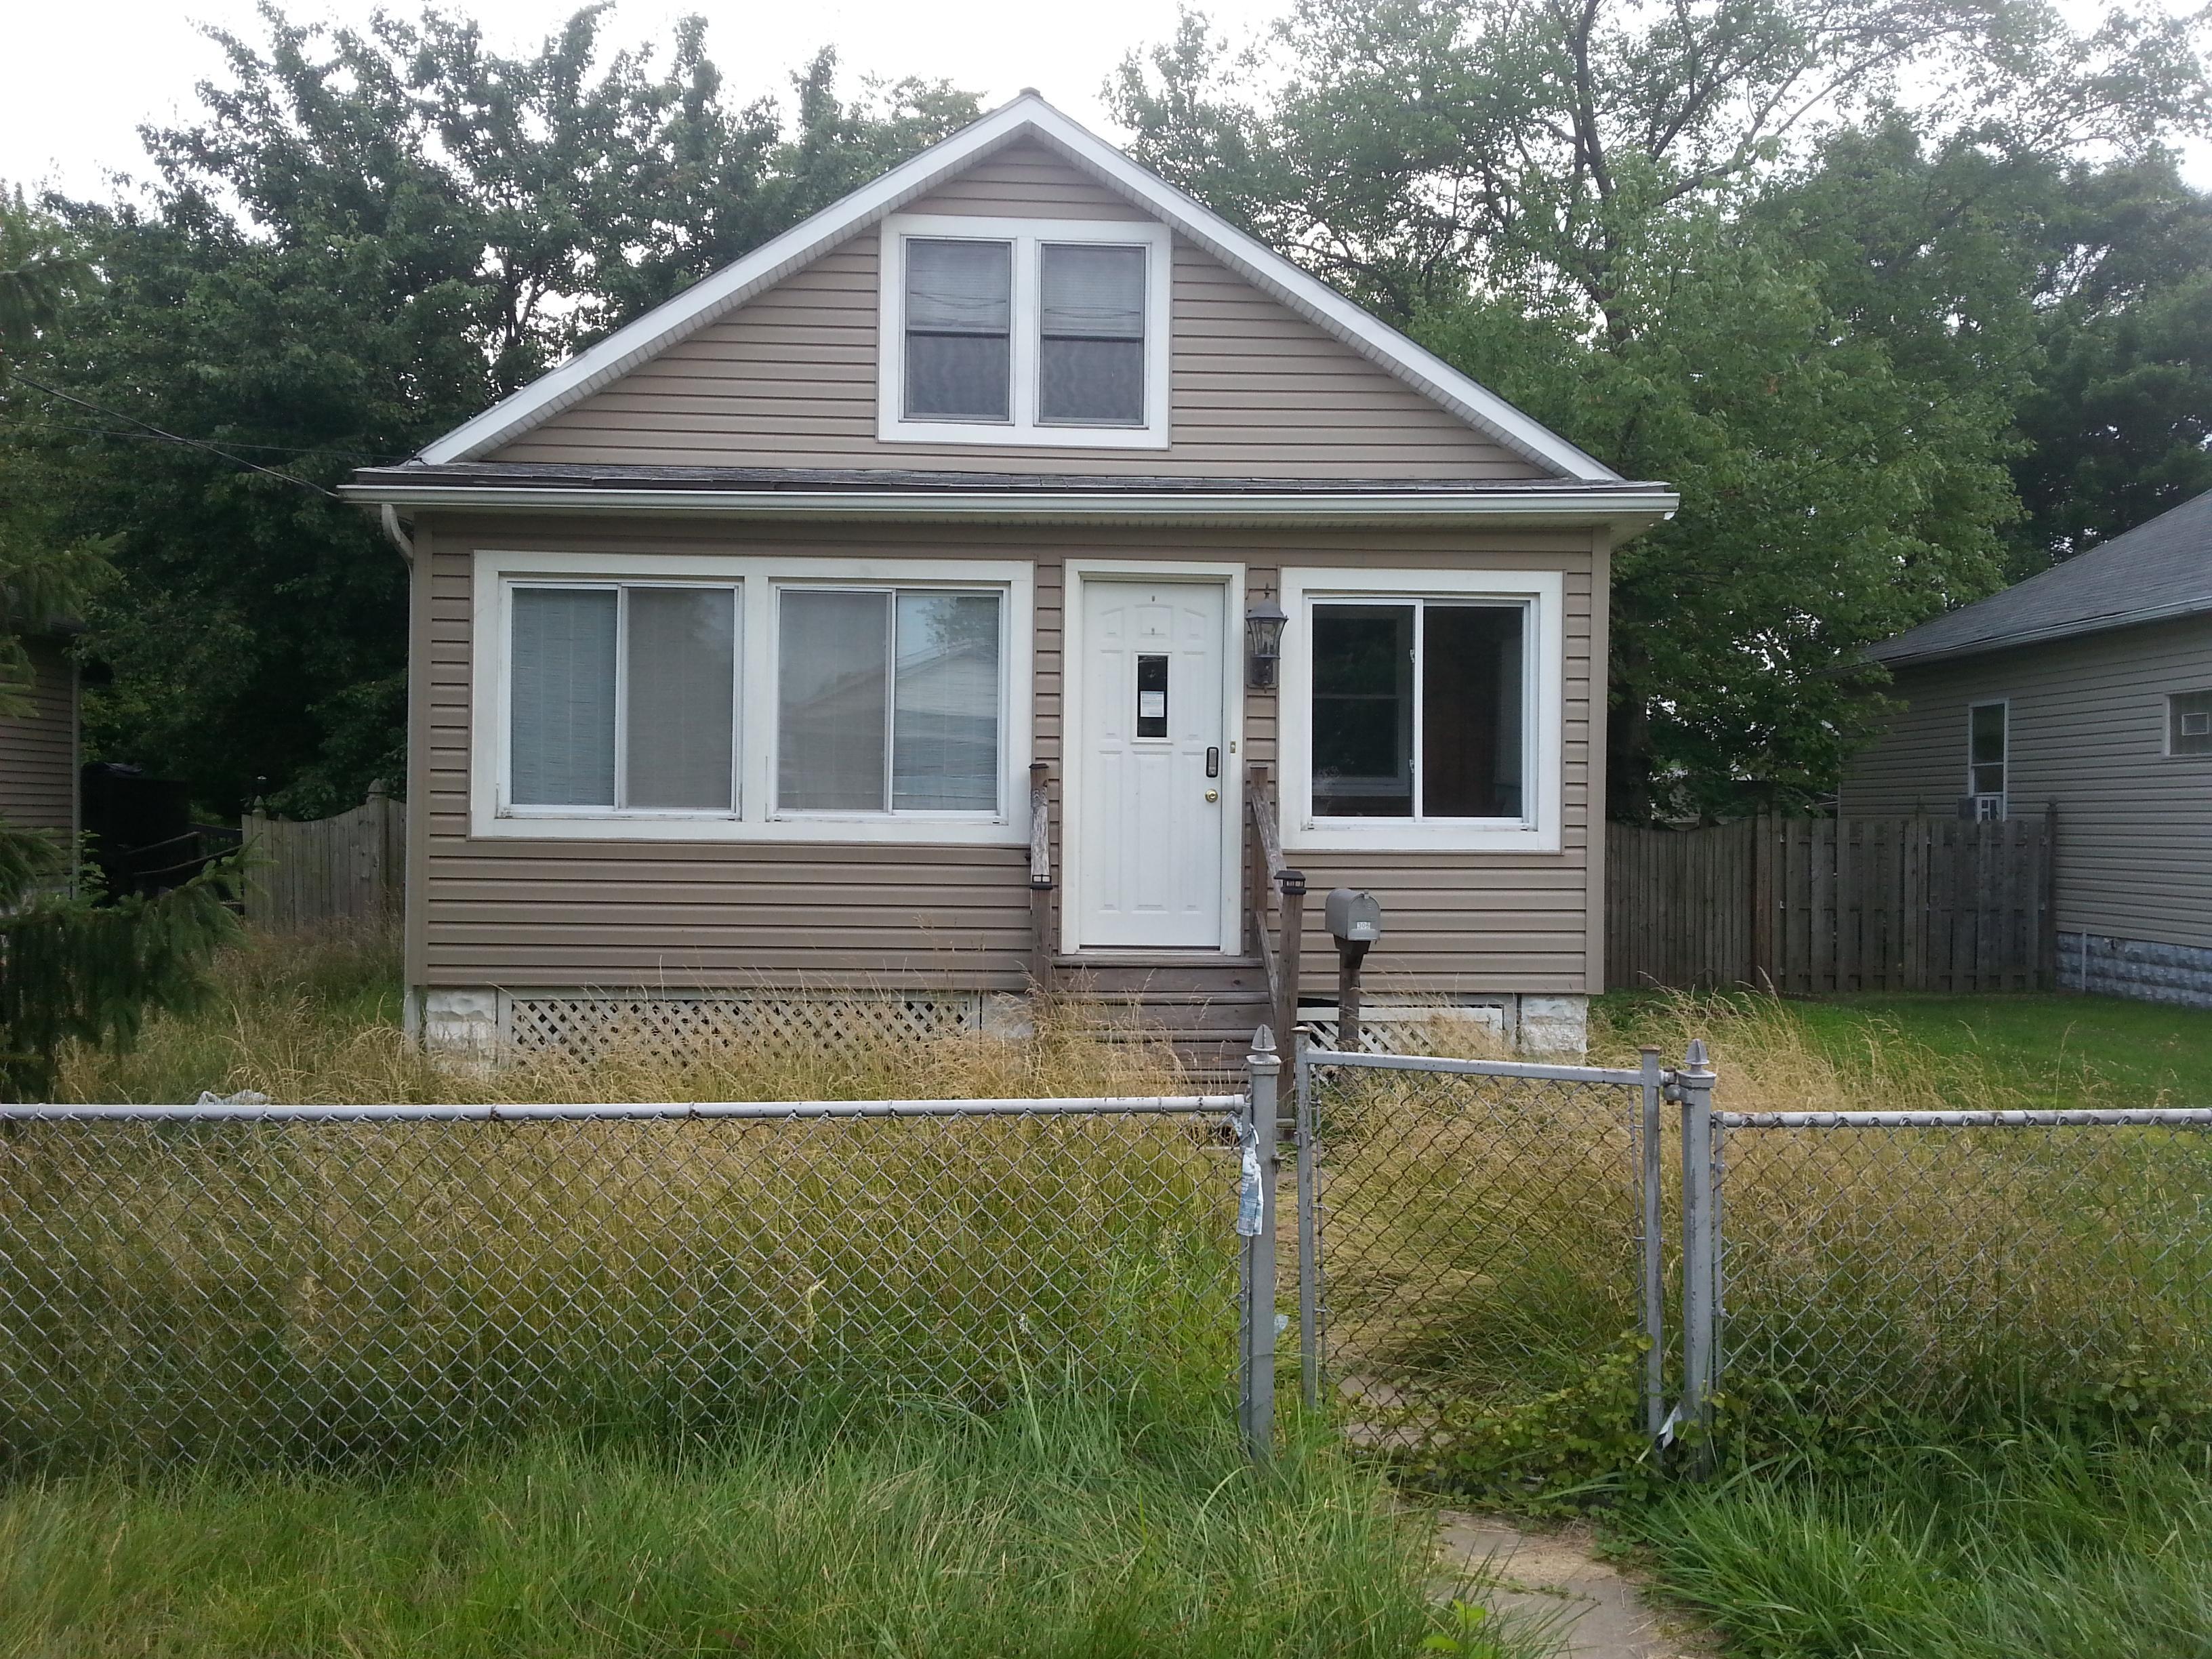 306 Lorraine Ave, Baltimore, MD 21221